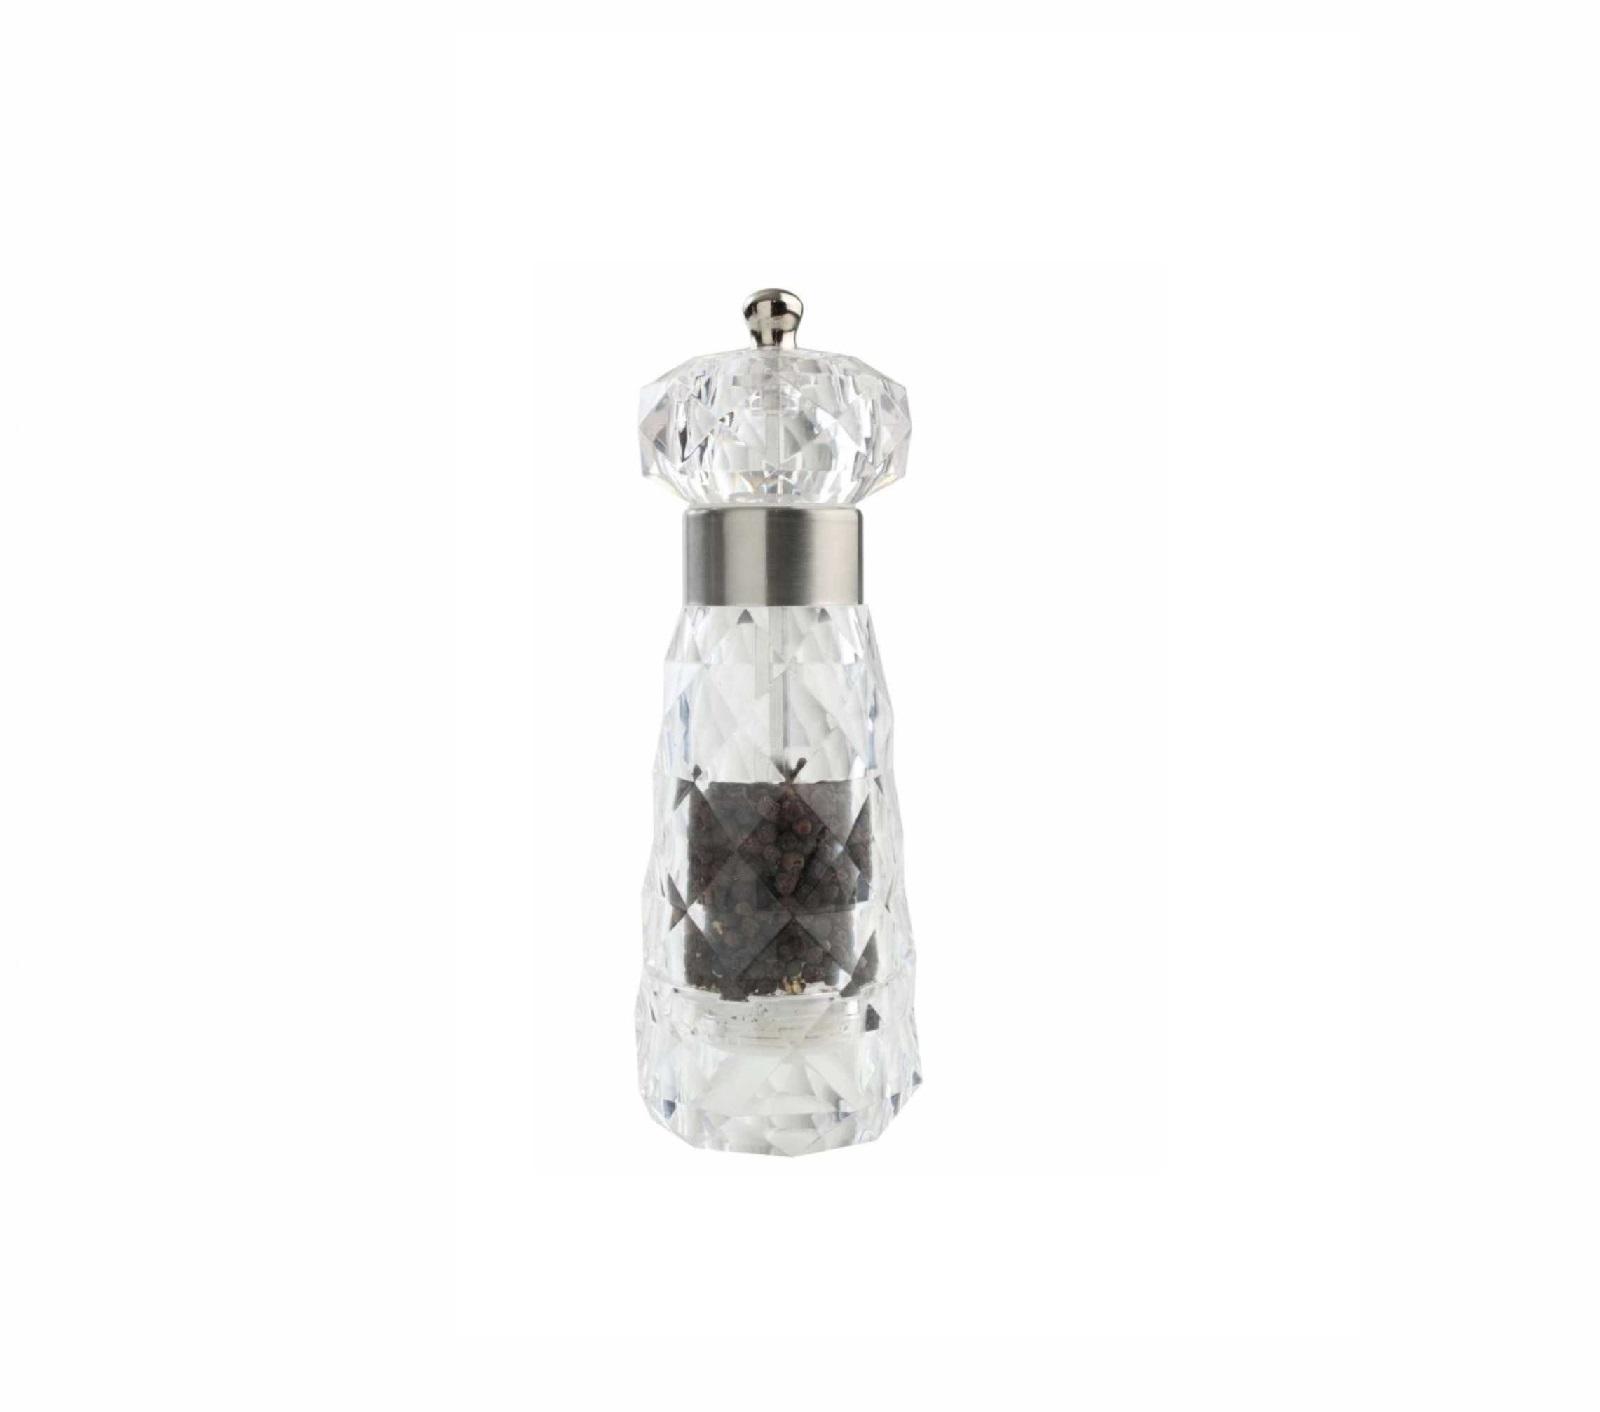 Мельница для перца T&G DIAMOND, высота 18 см, прозрачный T&G 12908 фото 1